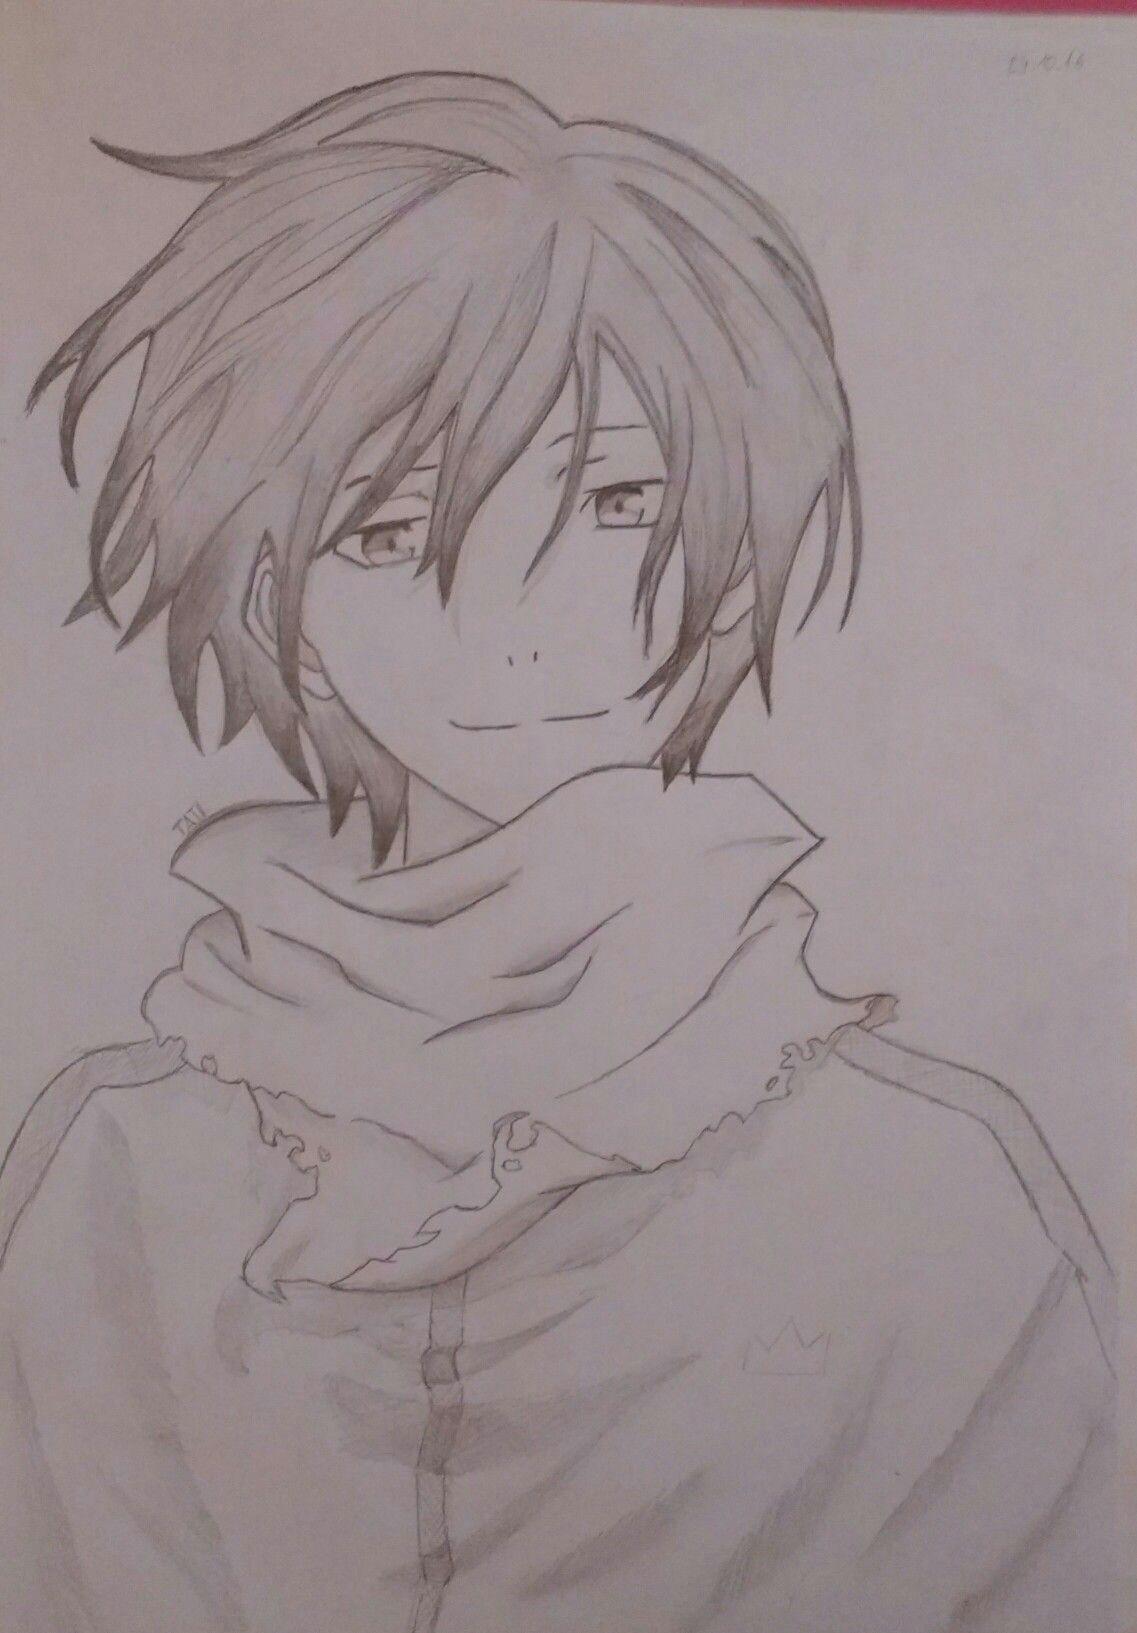 Anime Yato Drawing Yato noragami Drawings Pinterest Drawings Art Drawings and Art